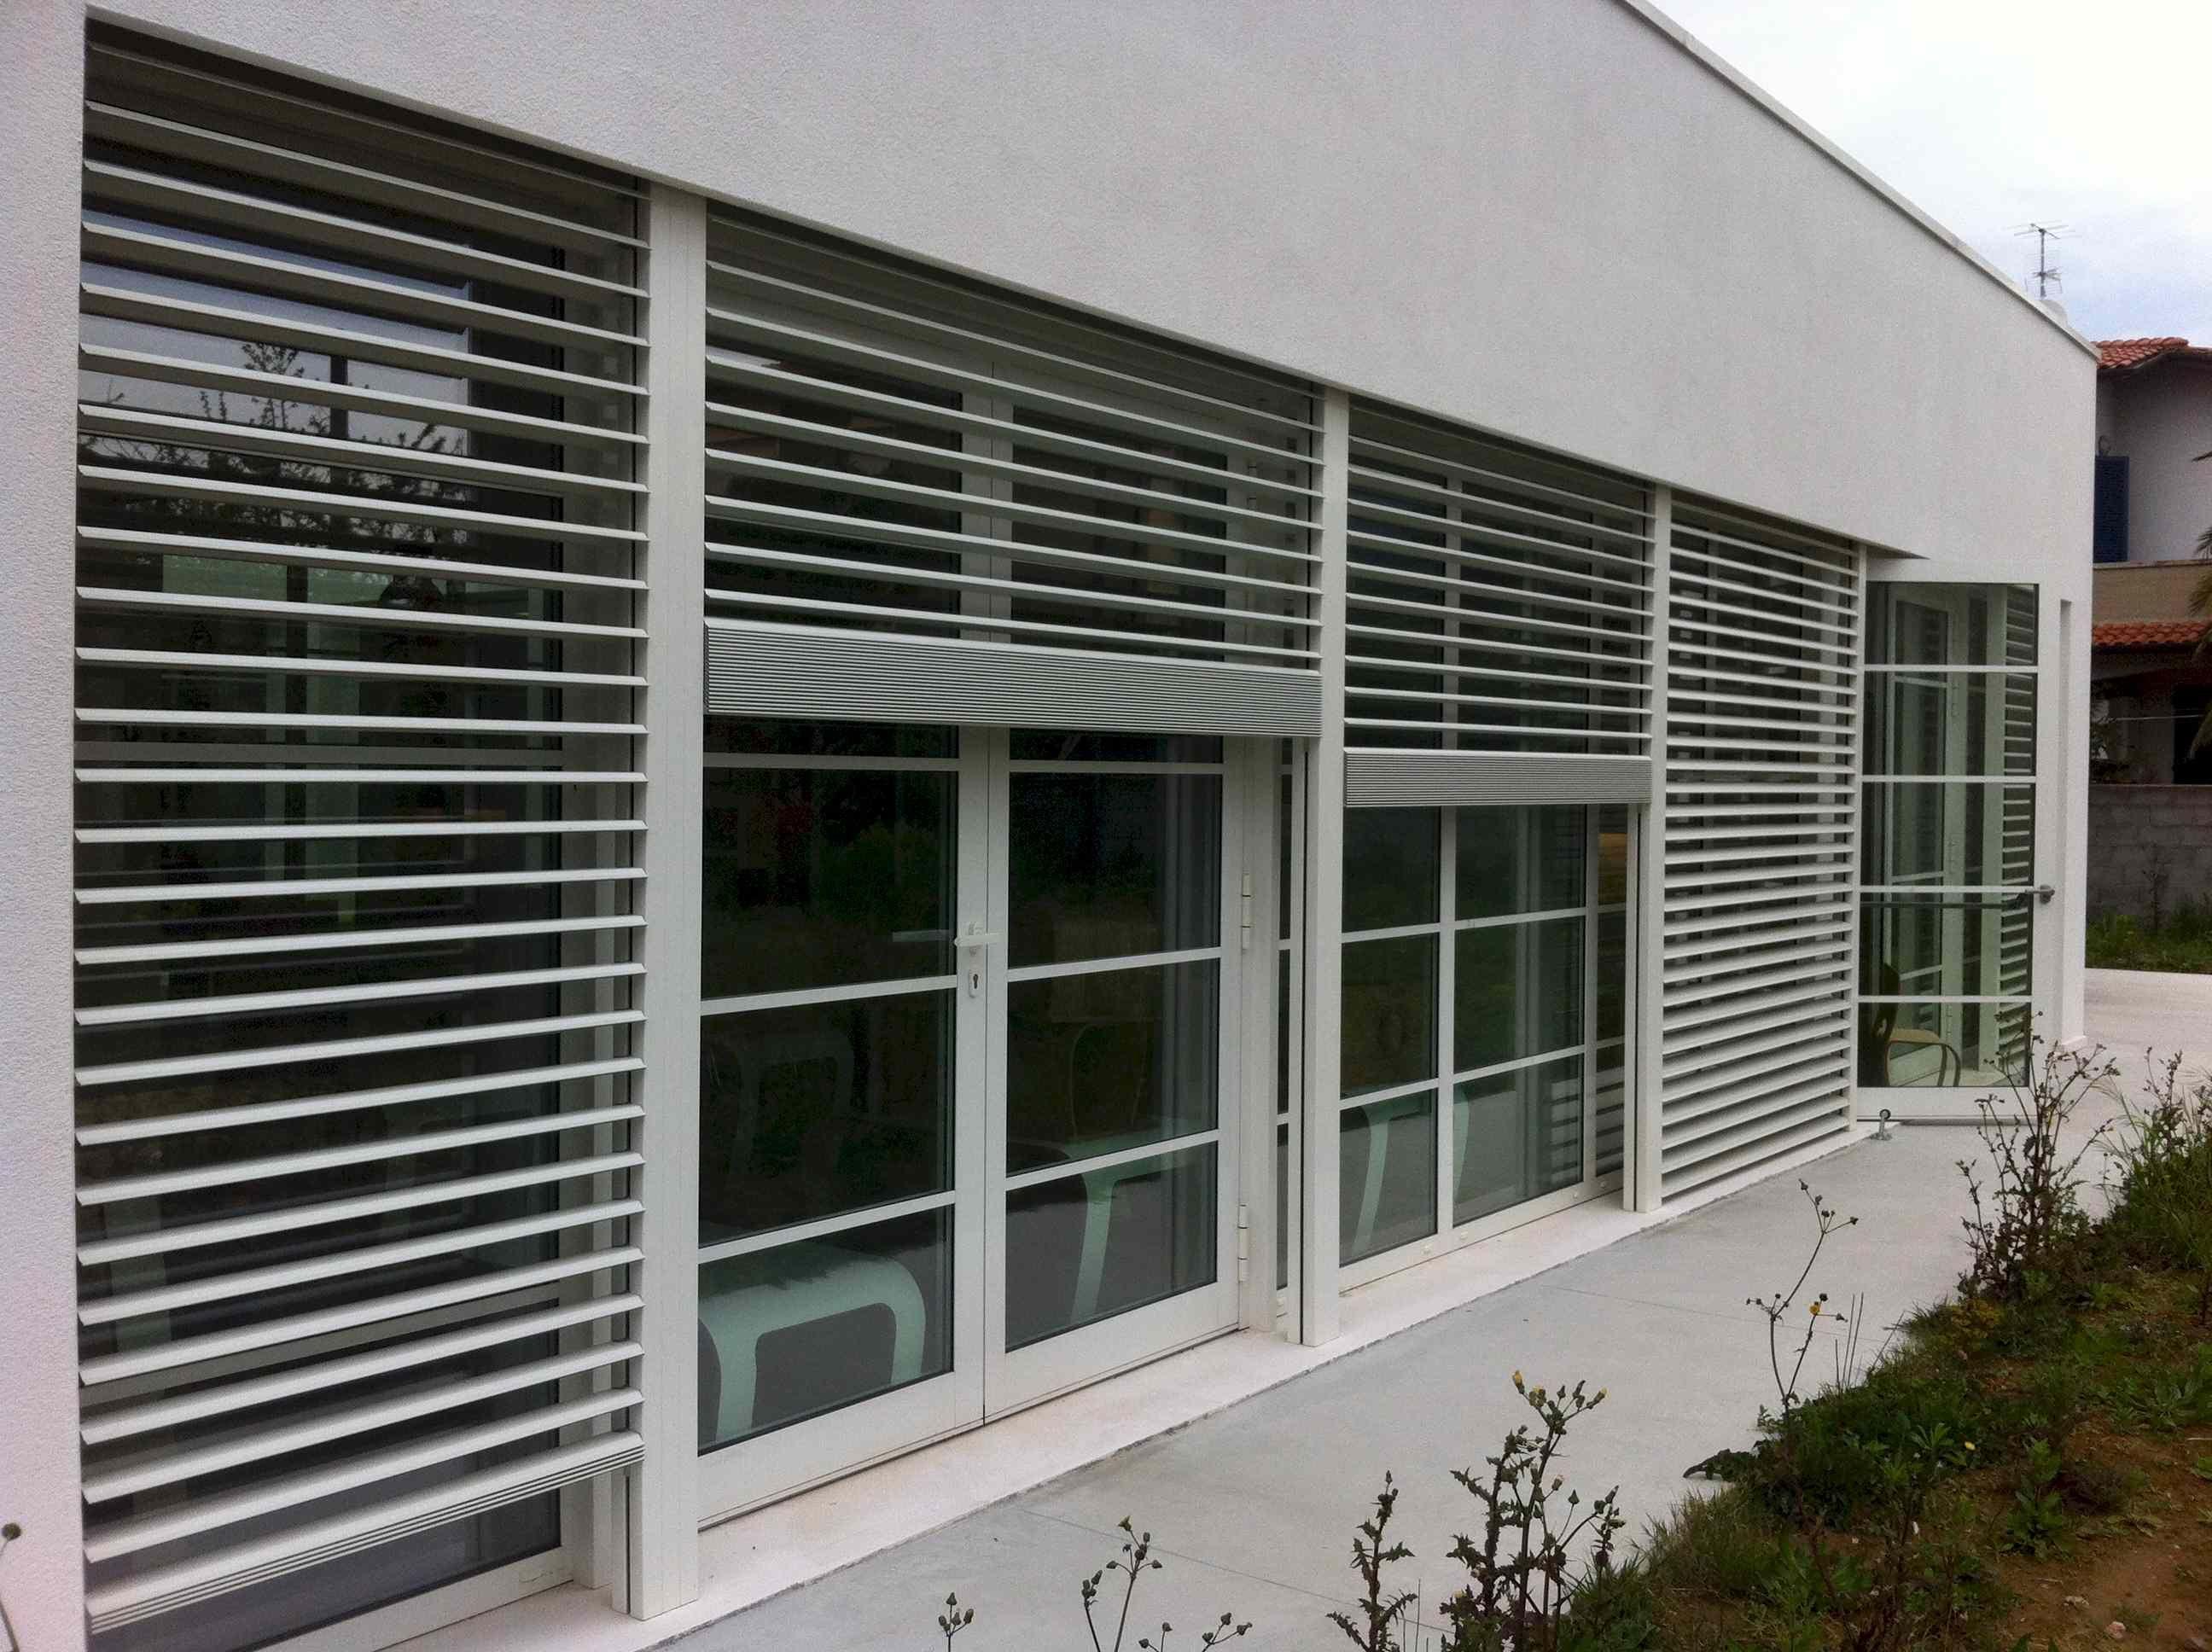 Frangisole In Alluminio Legno Scorrevoli Orientabili  ~ Ventanas De Seguridad Para Casas